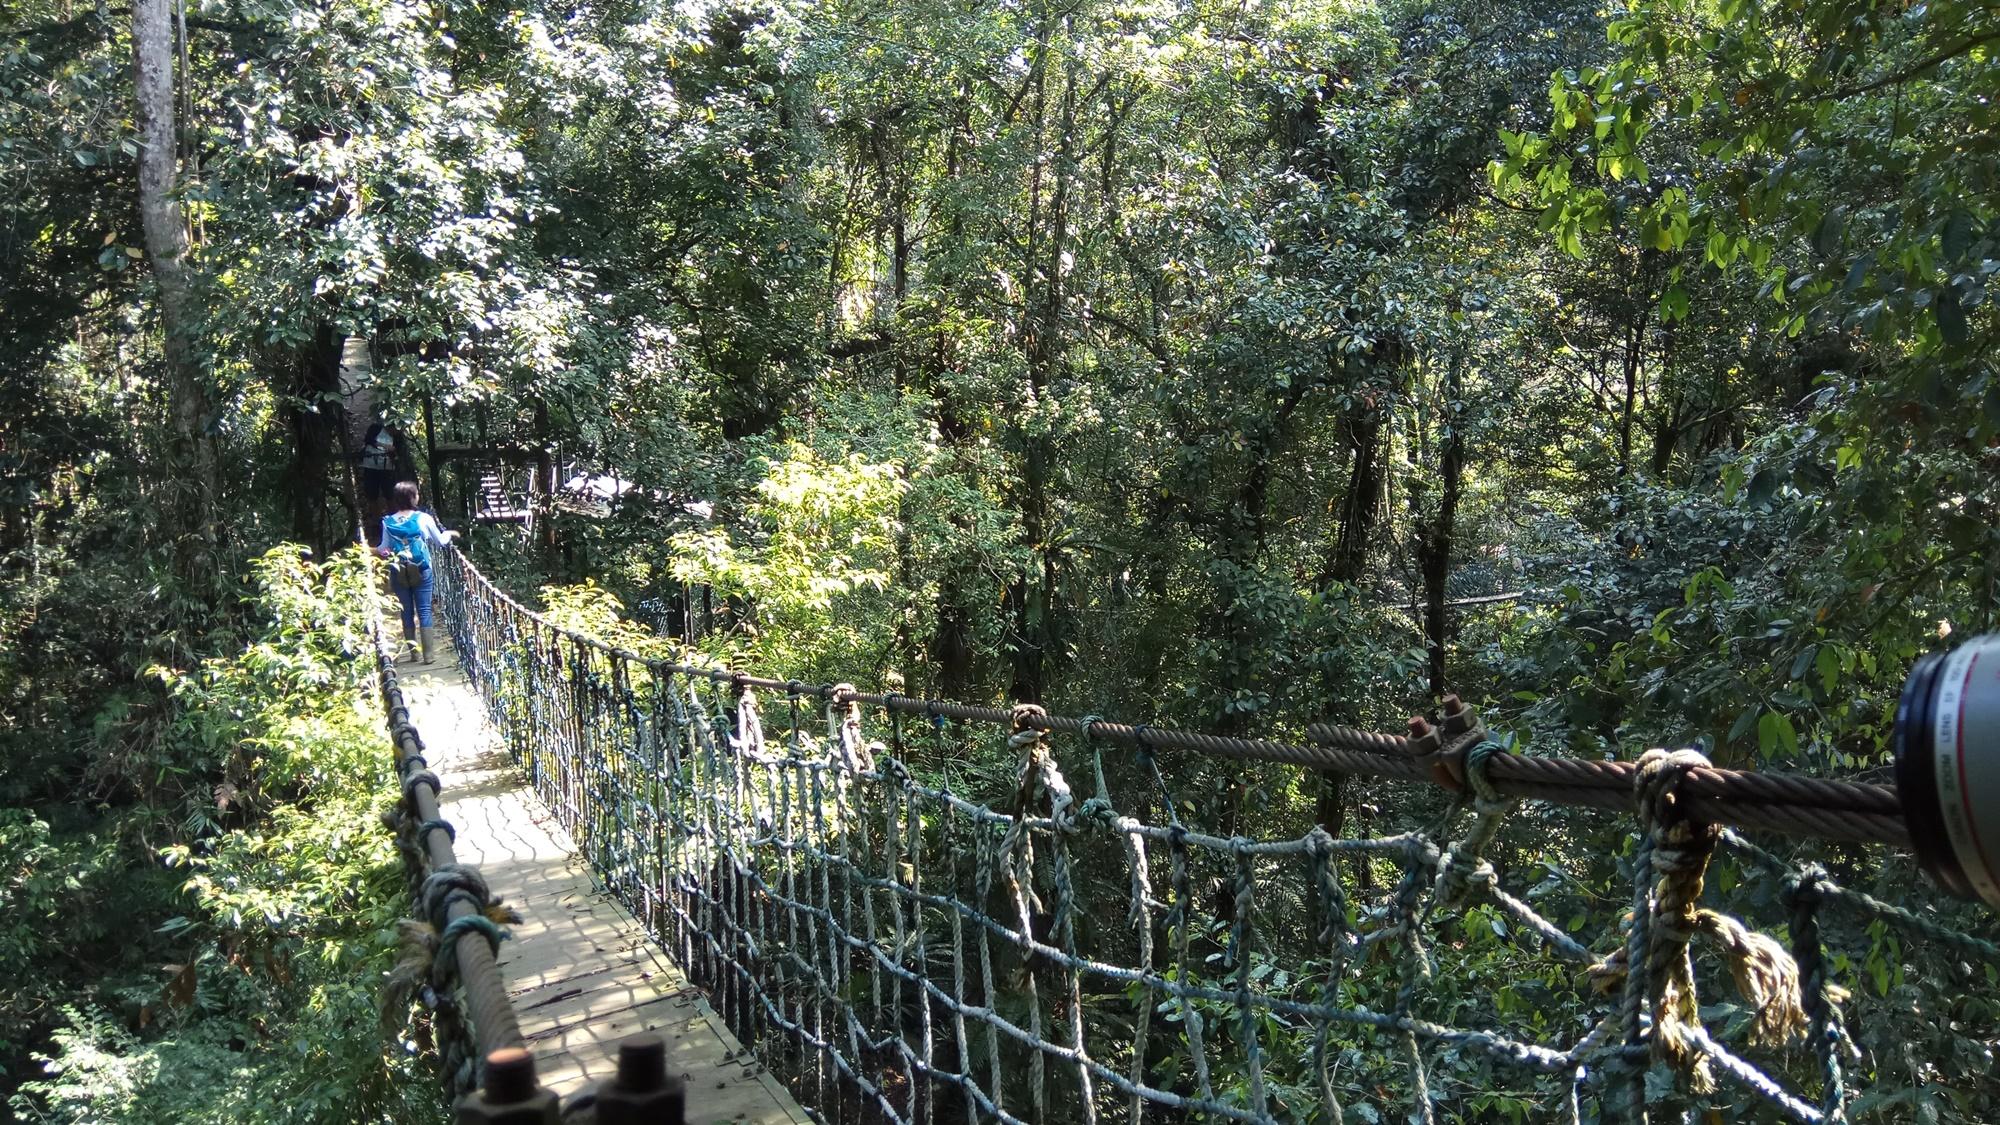 Jembatan gantung pusat penelitian Cikaniki